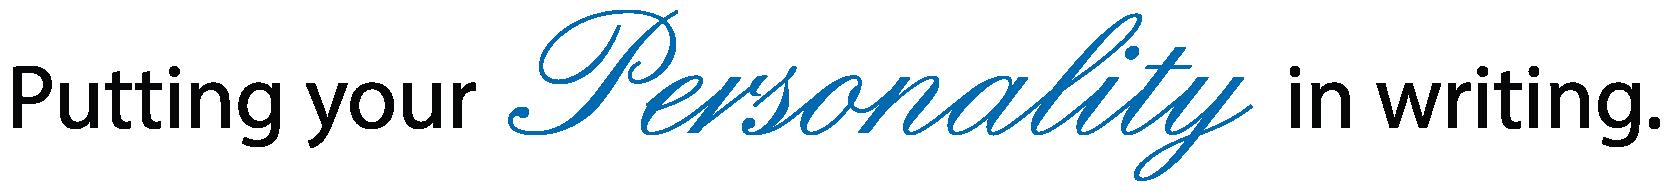 Carolina Pen Company logo final_Tagline.png